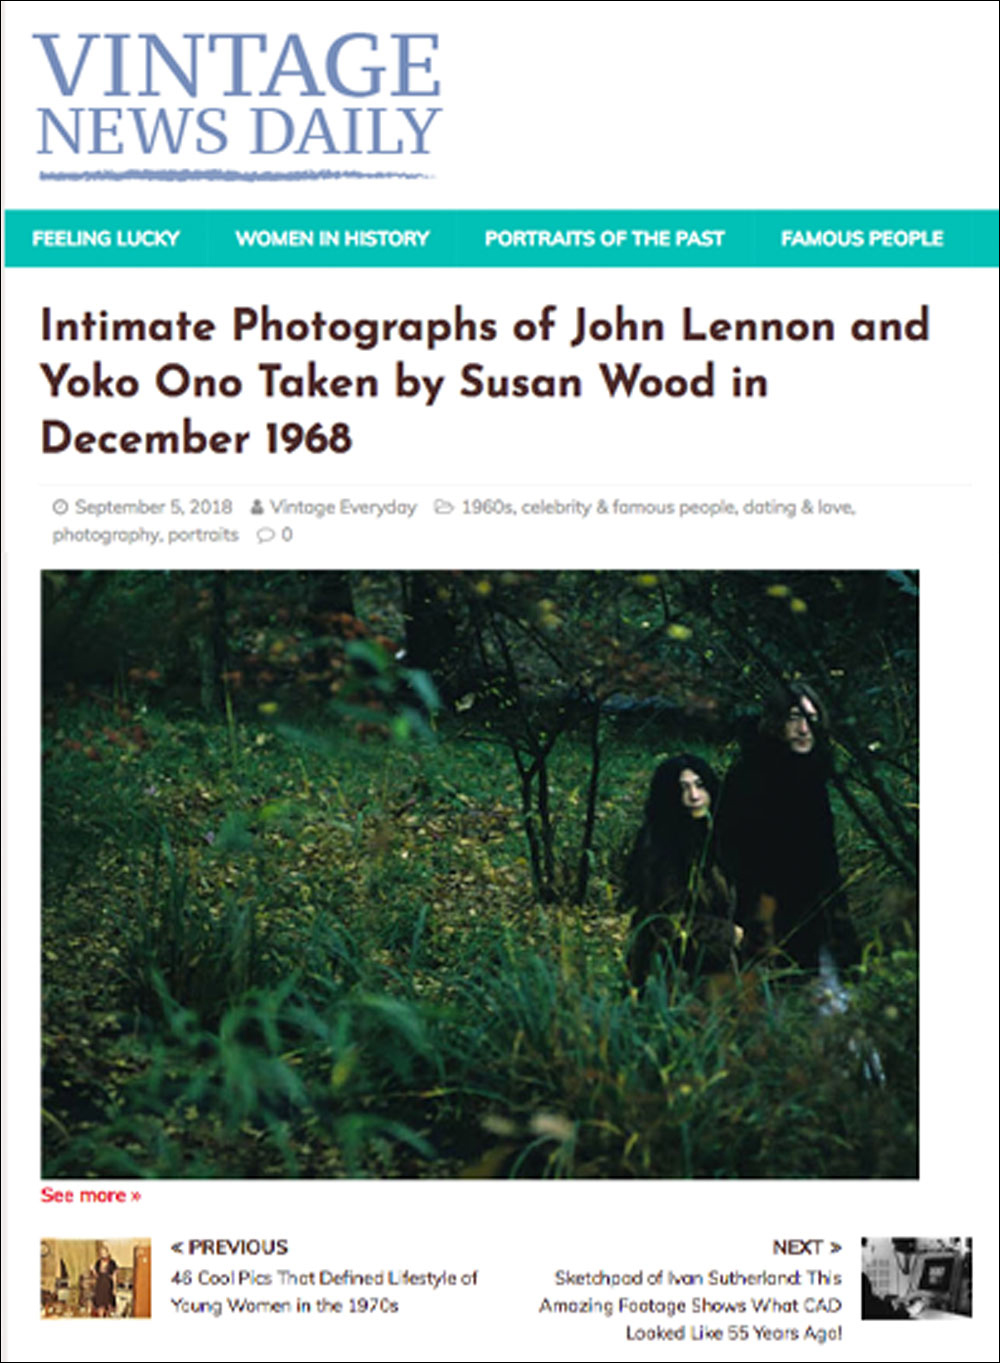 John-Lennon-&-Yoko-Ono-on-Vintage-News-Daily.jpg